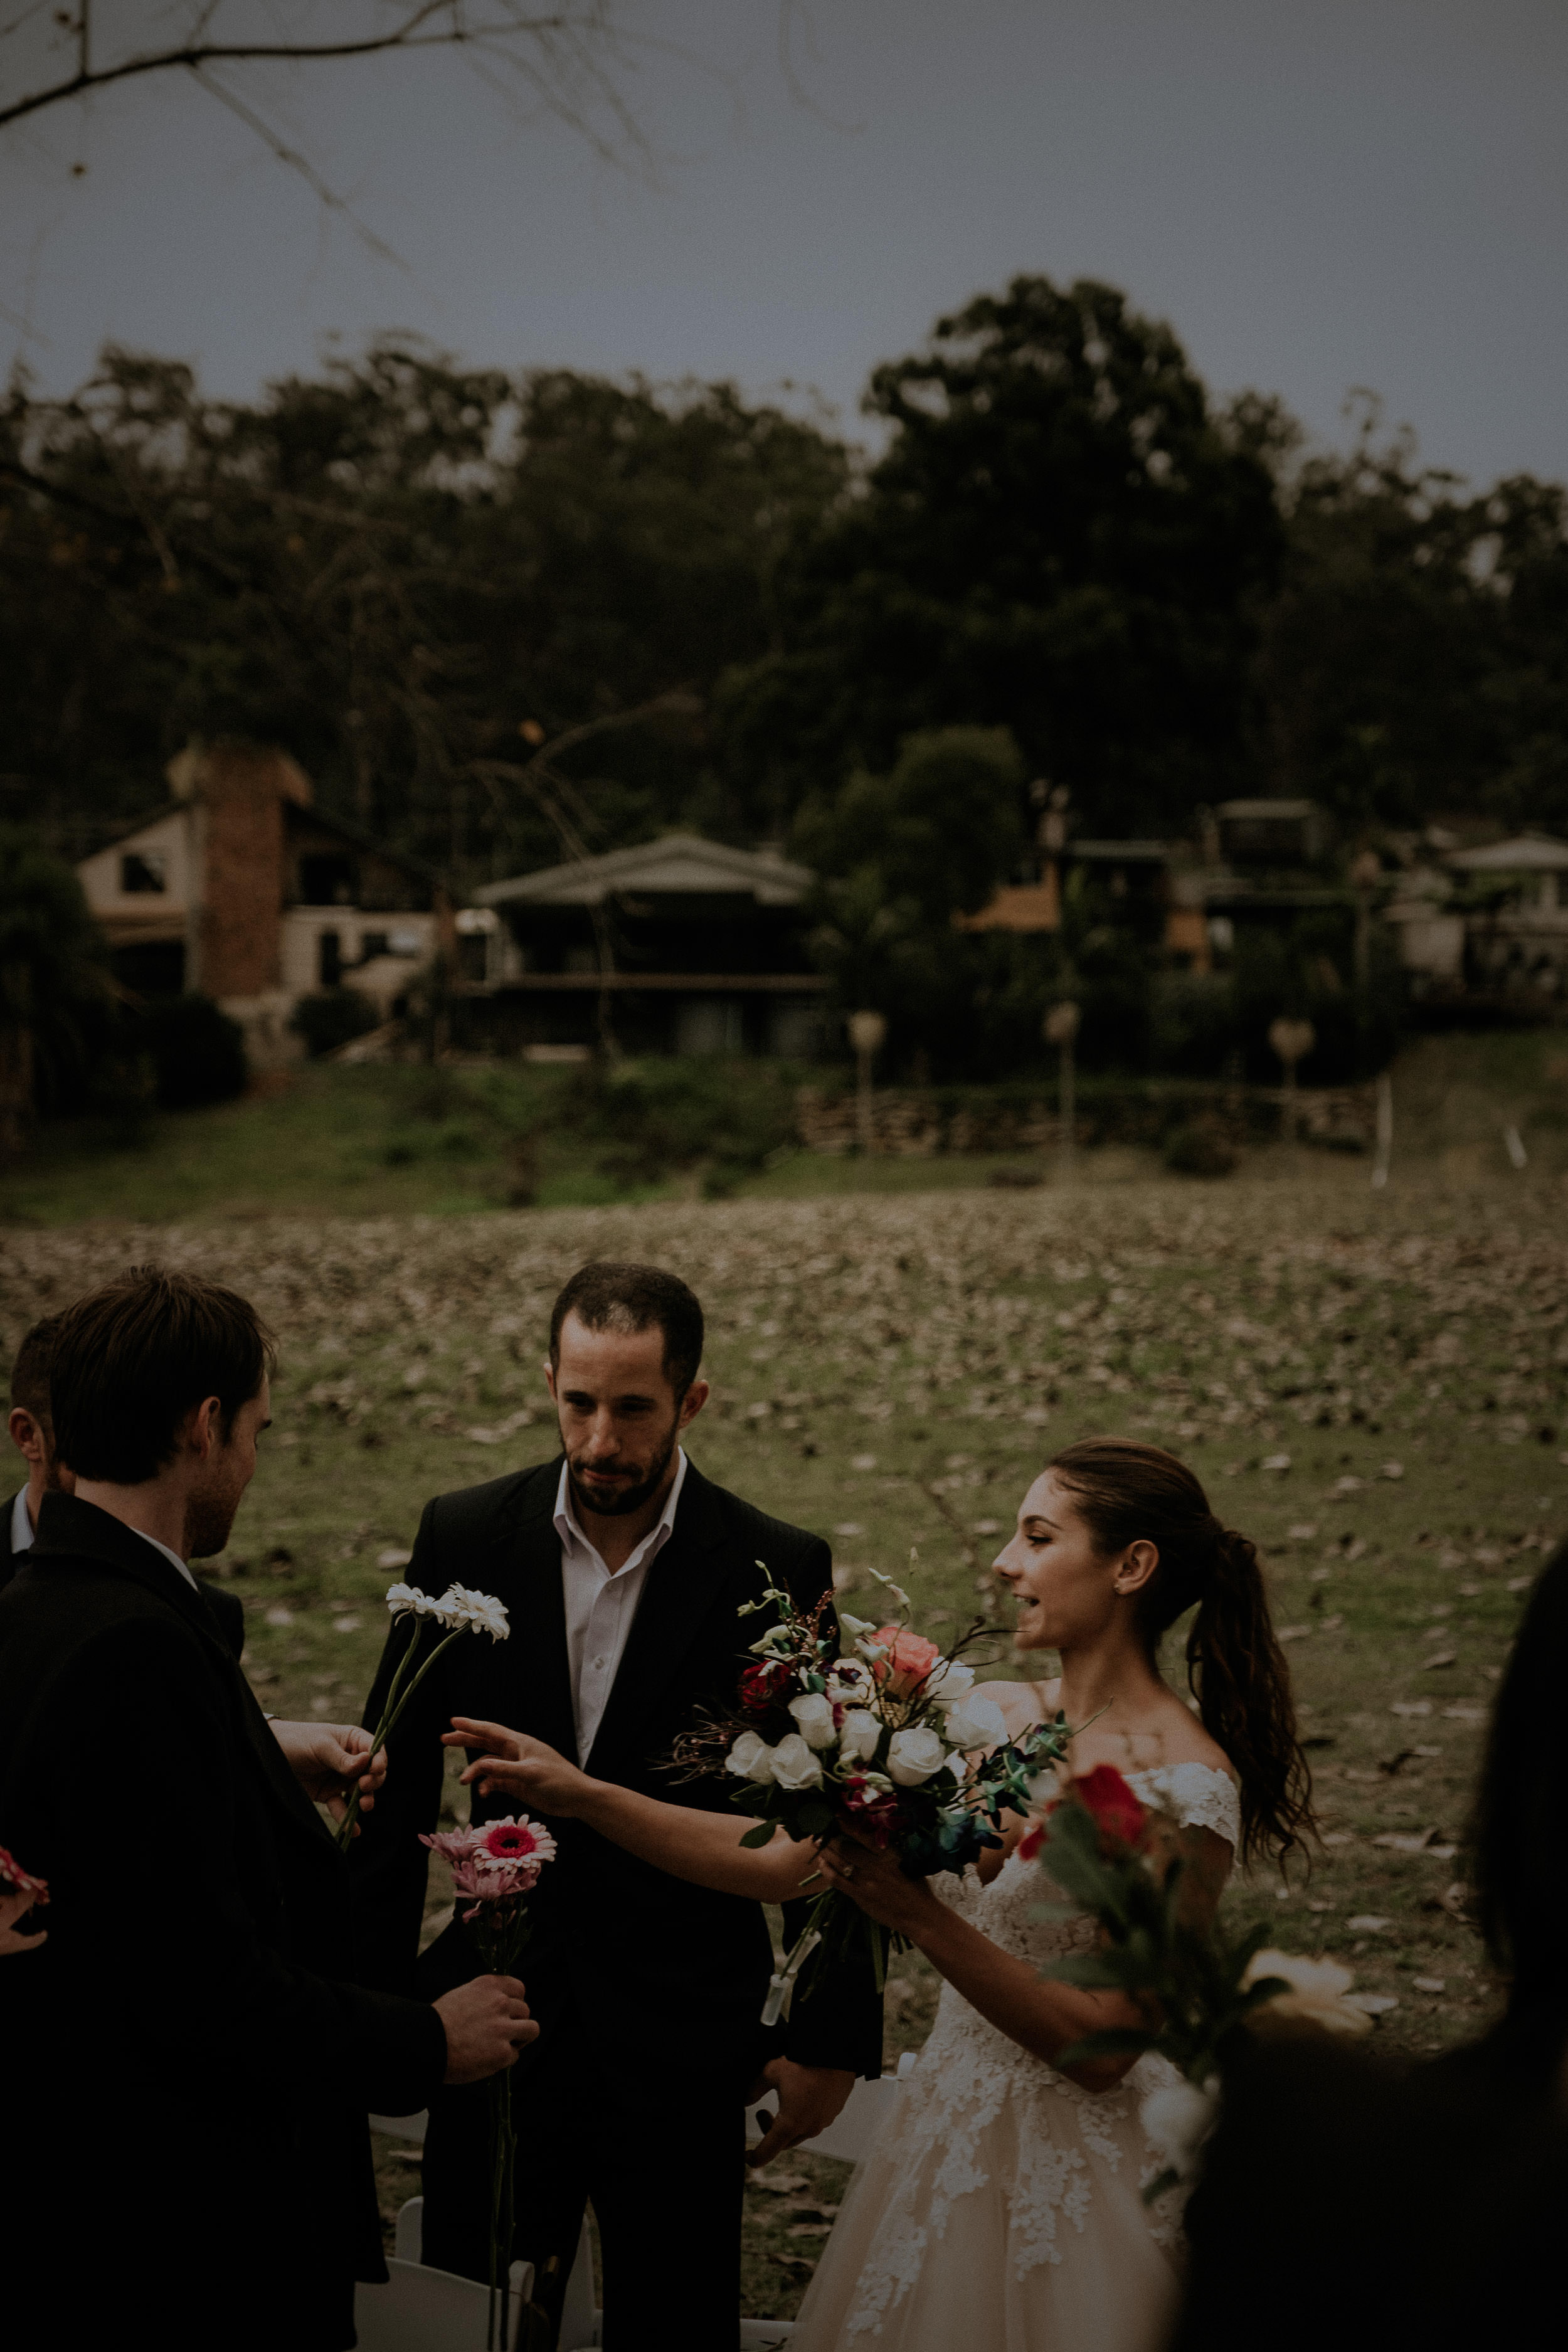 g_c wedding - kings _ thieves elopement wedding photography - blog 20.jpg